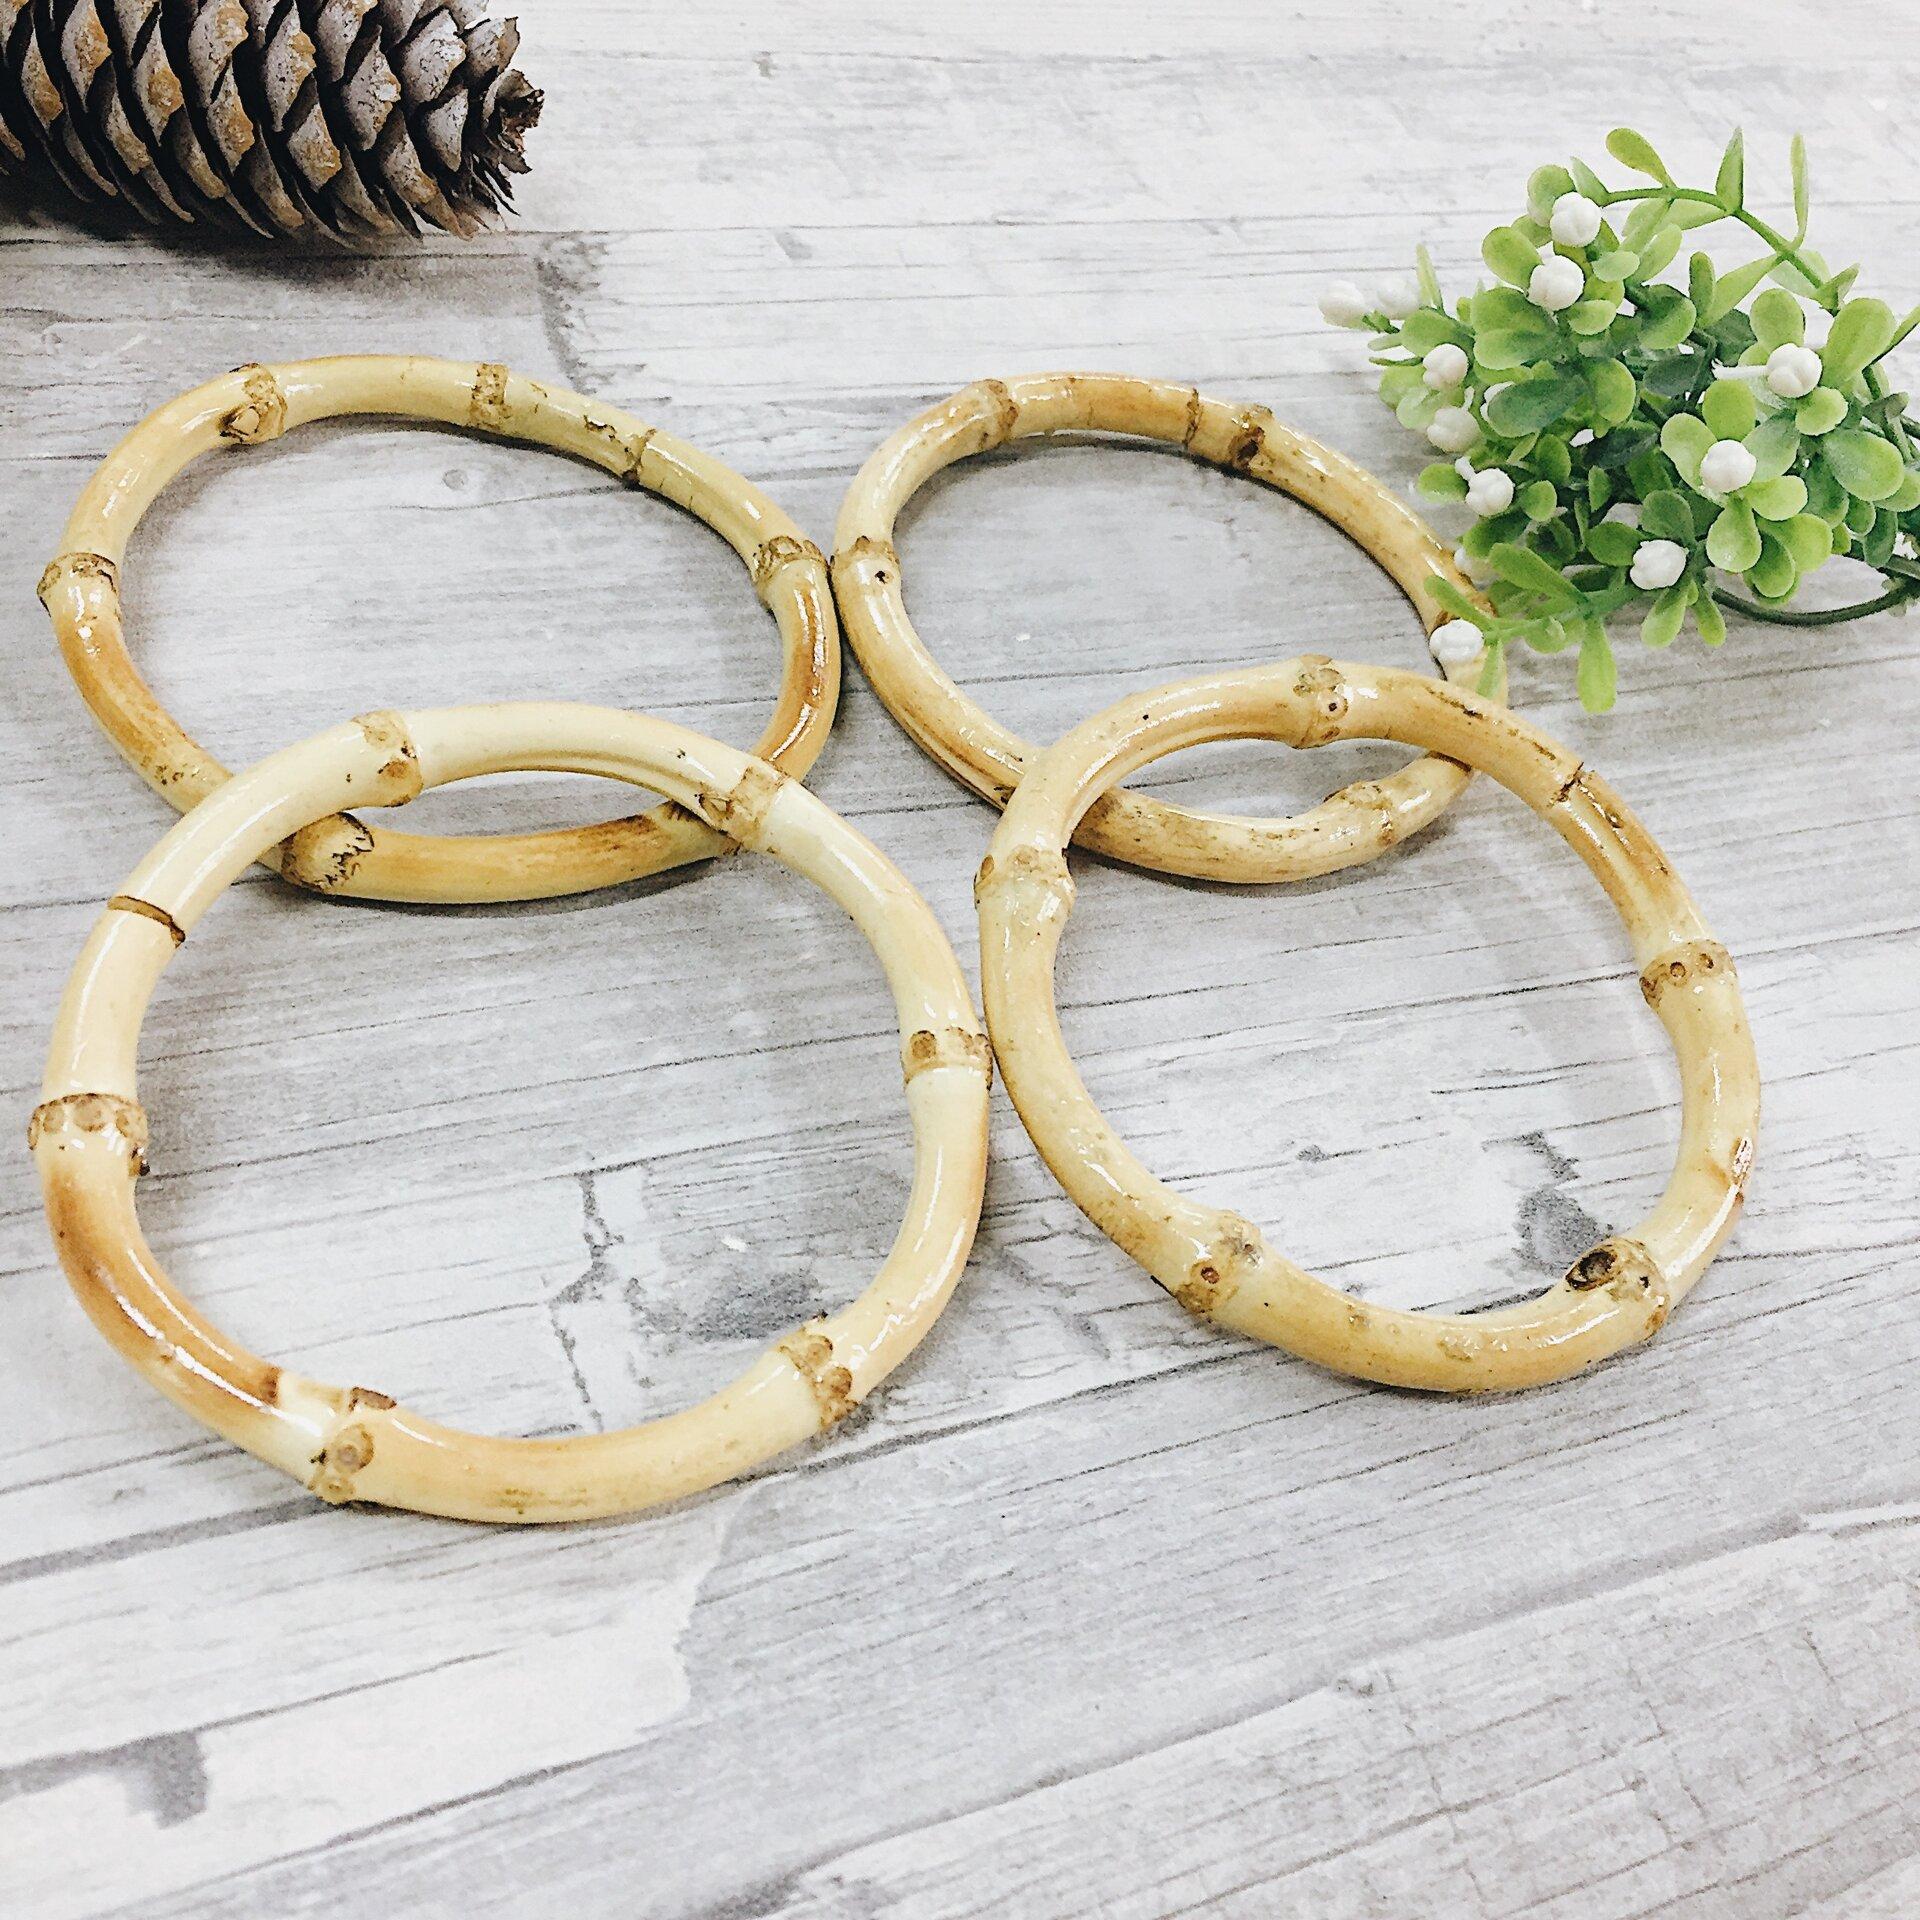 Ручки-кольца из бамбука для клатча, d 85мм - фото pic_6a671674fd47c220687afdb024751f62_1920x9000_1.jpg